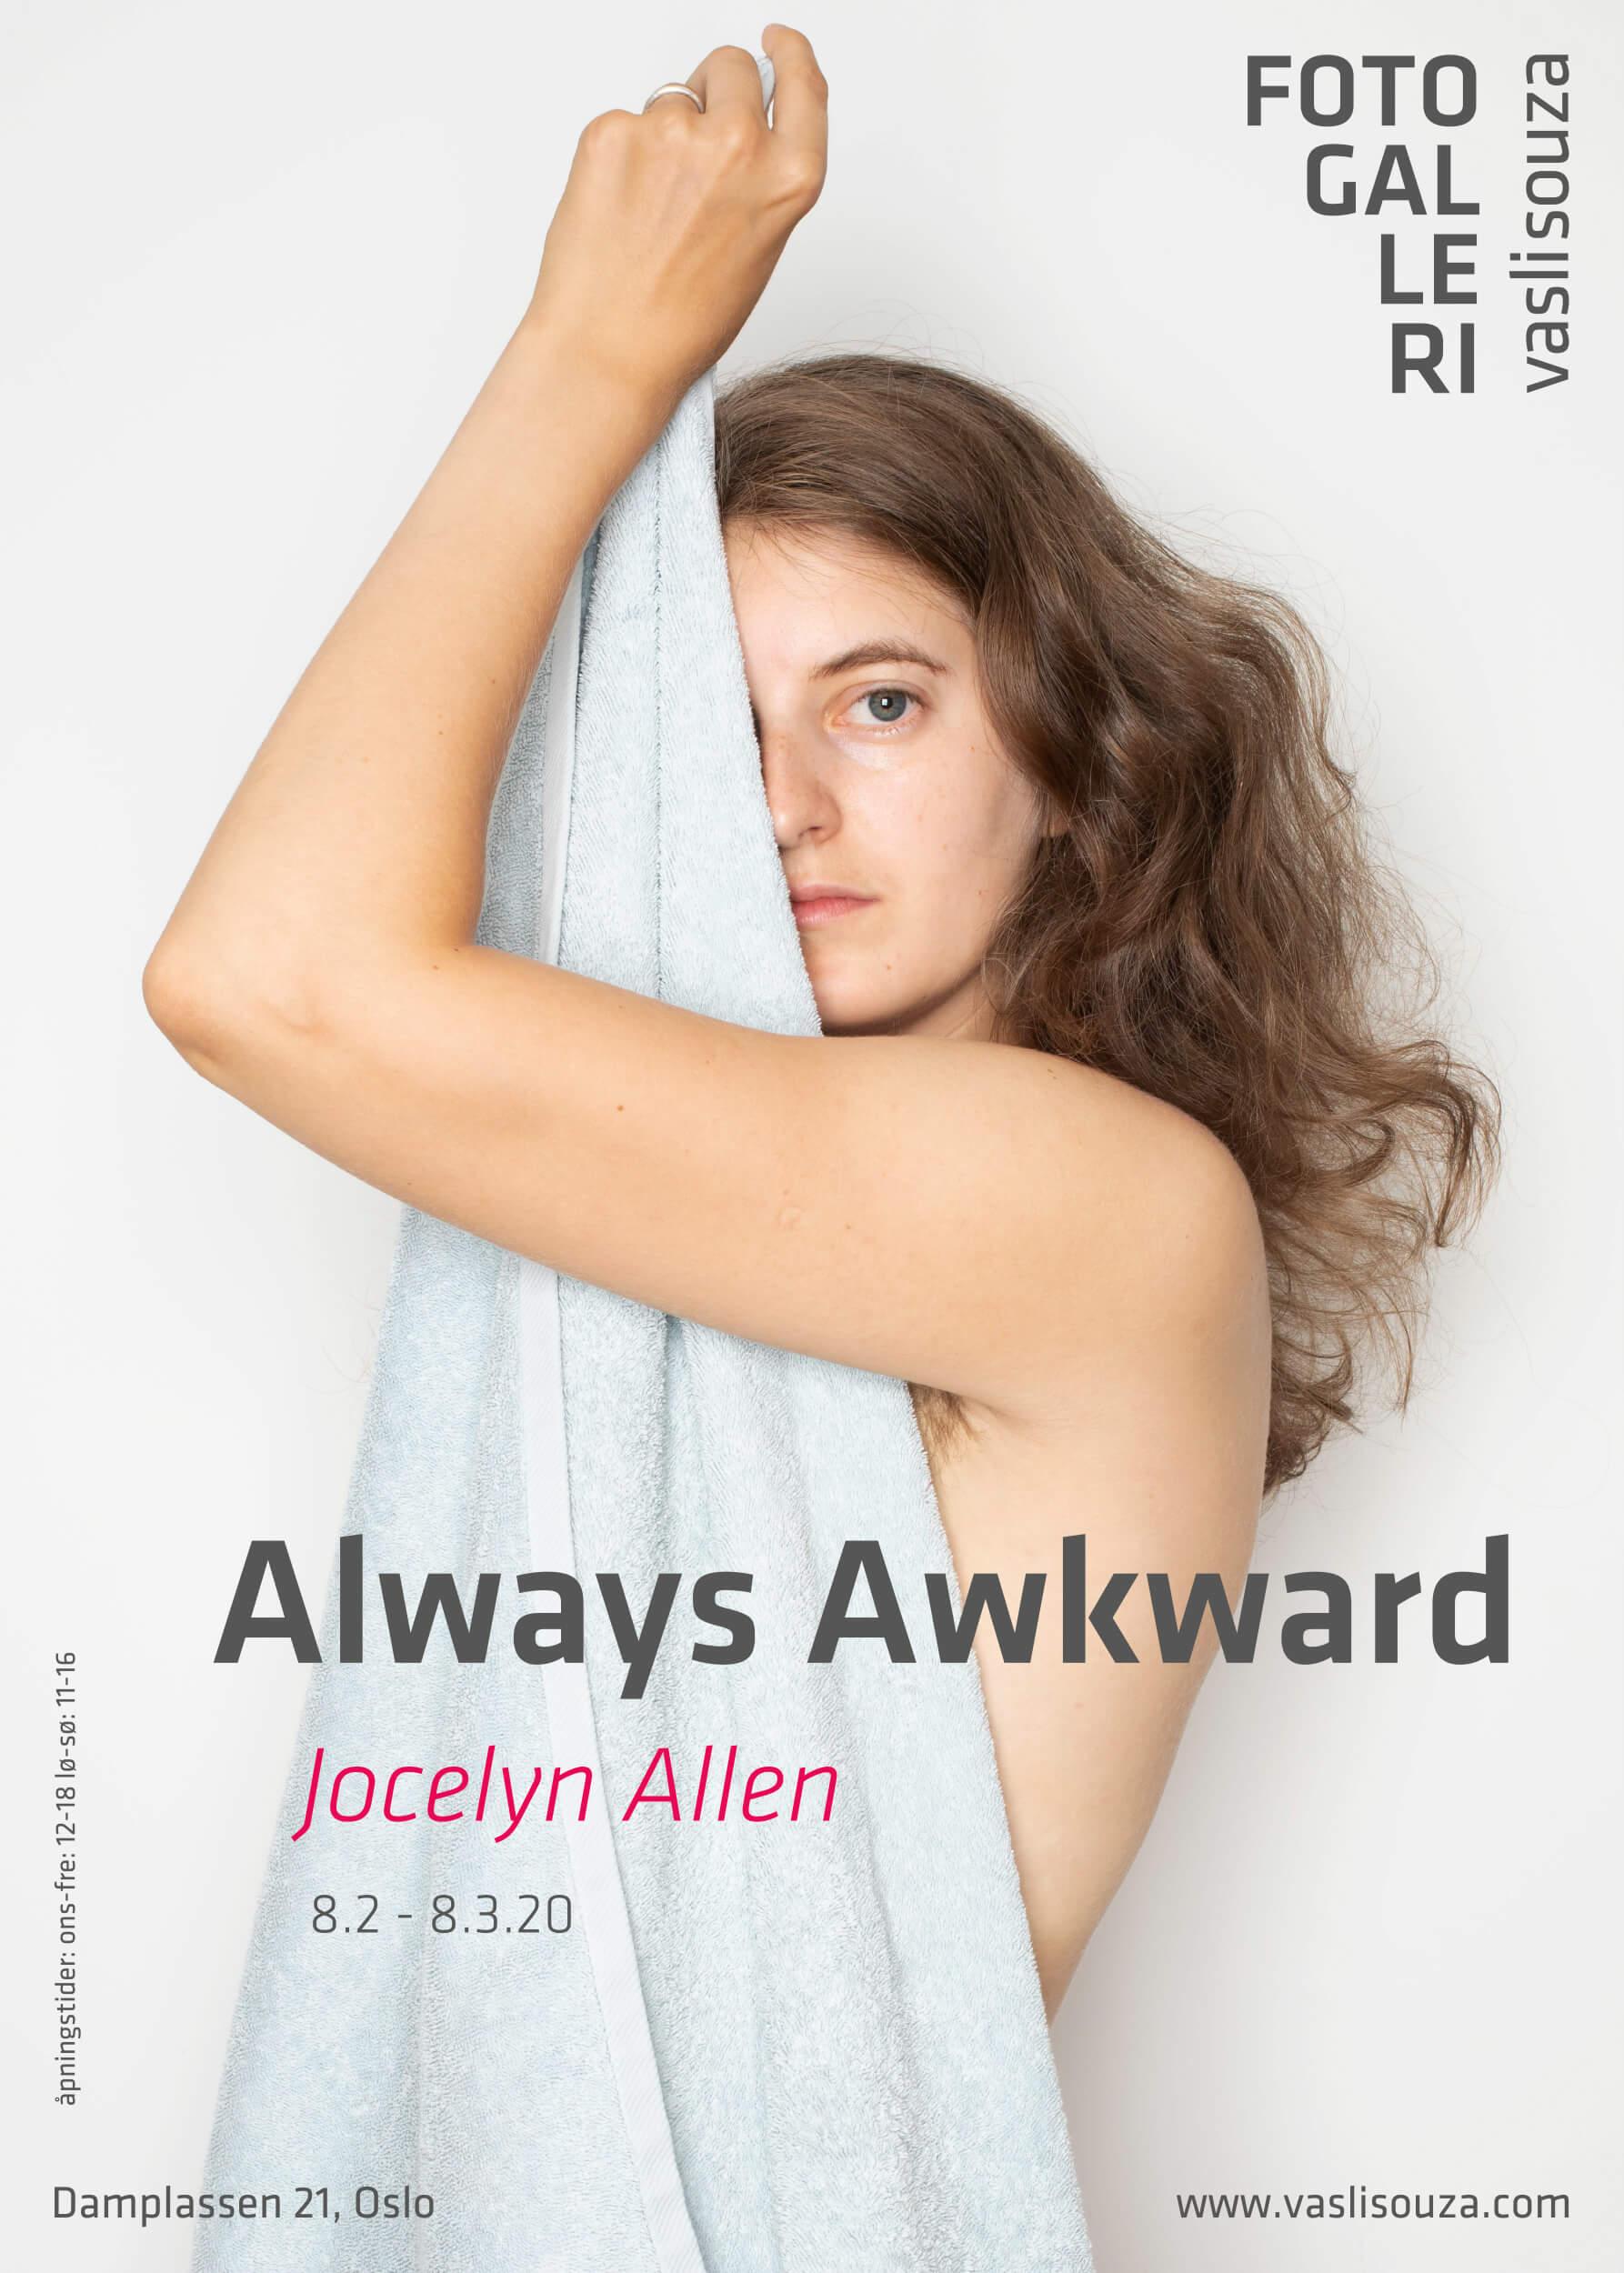 alwaysawkward-final-poster-v10-3